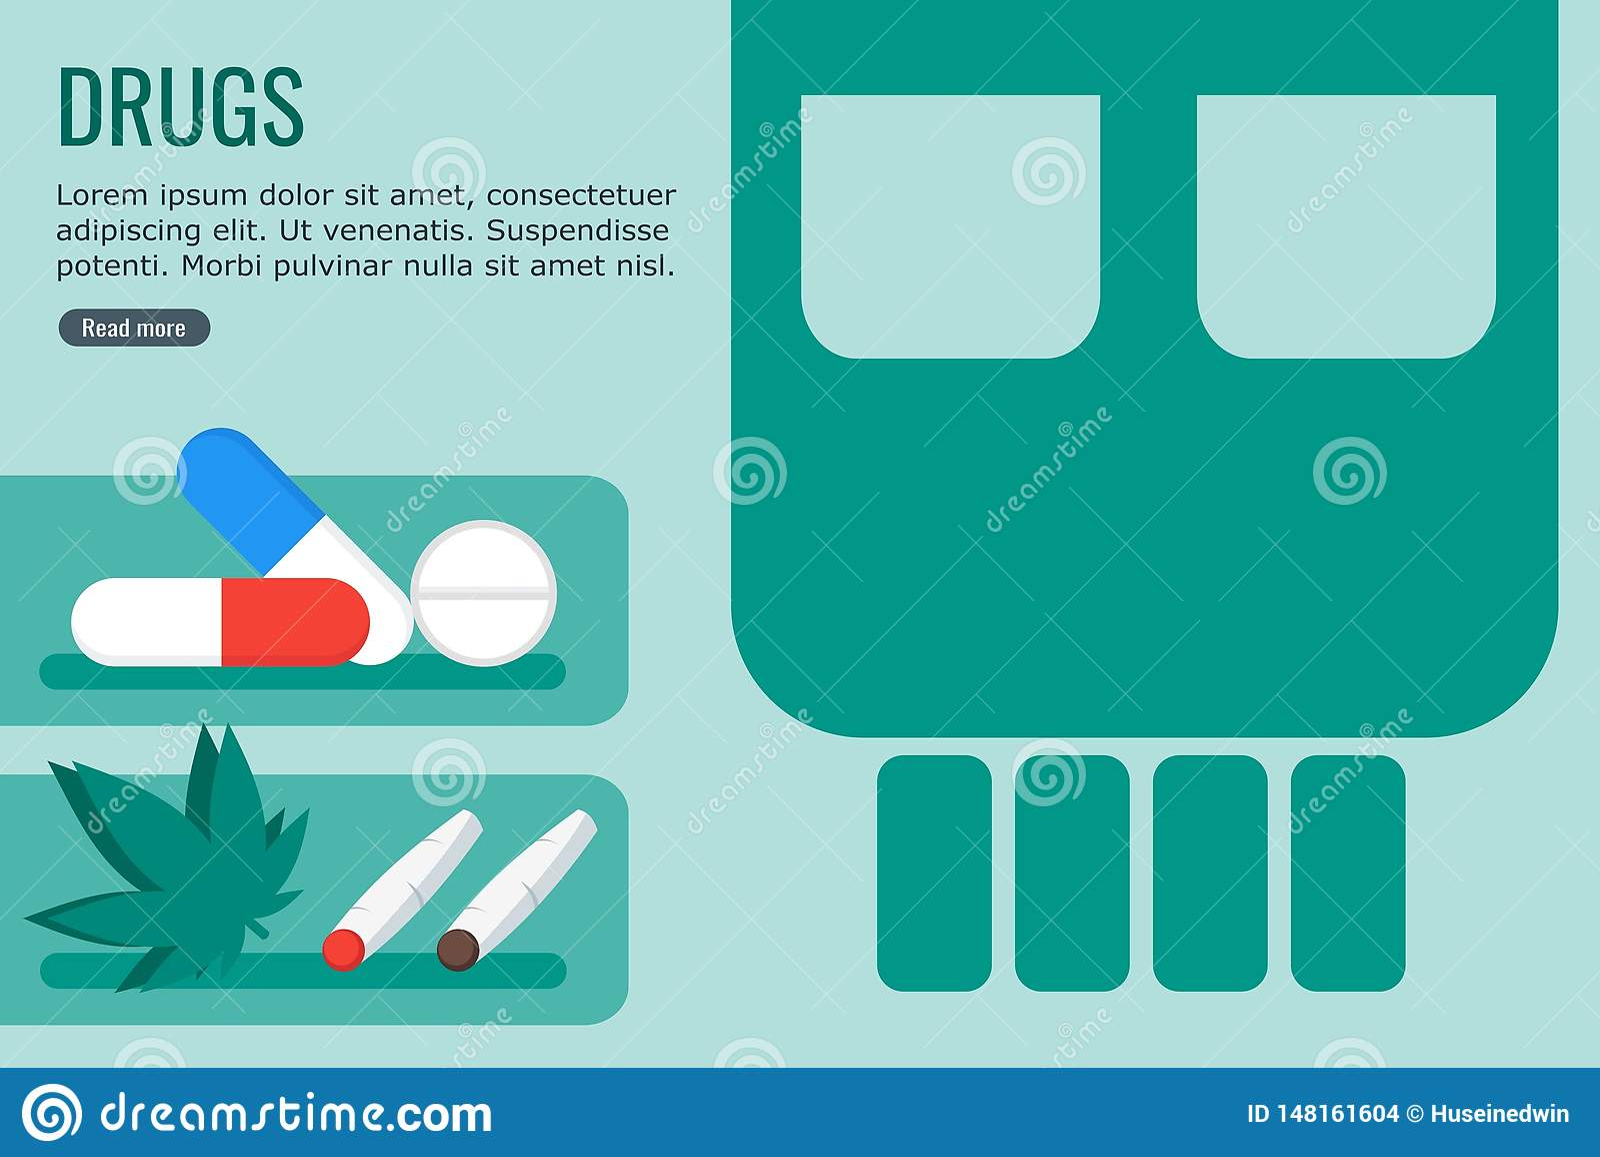 Dangerous Drugs for Info Graphic